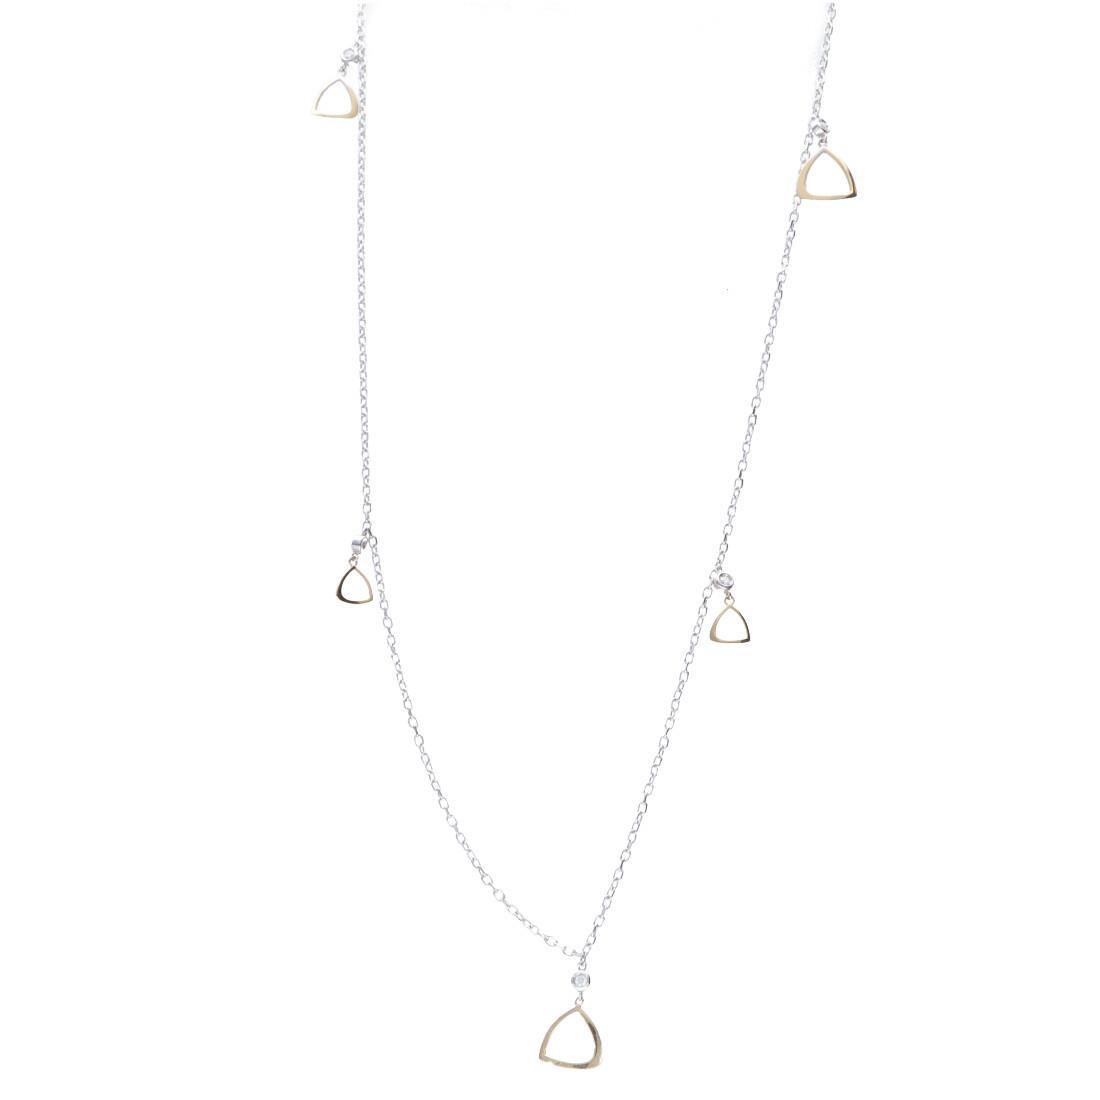 Collana lunga con diamanti - ALFIERI & ST. JOHN